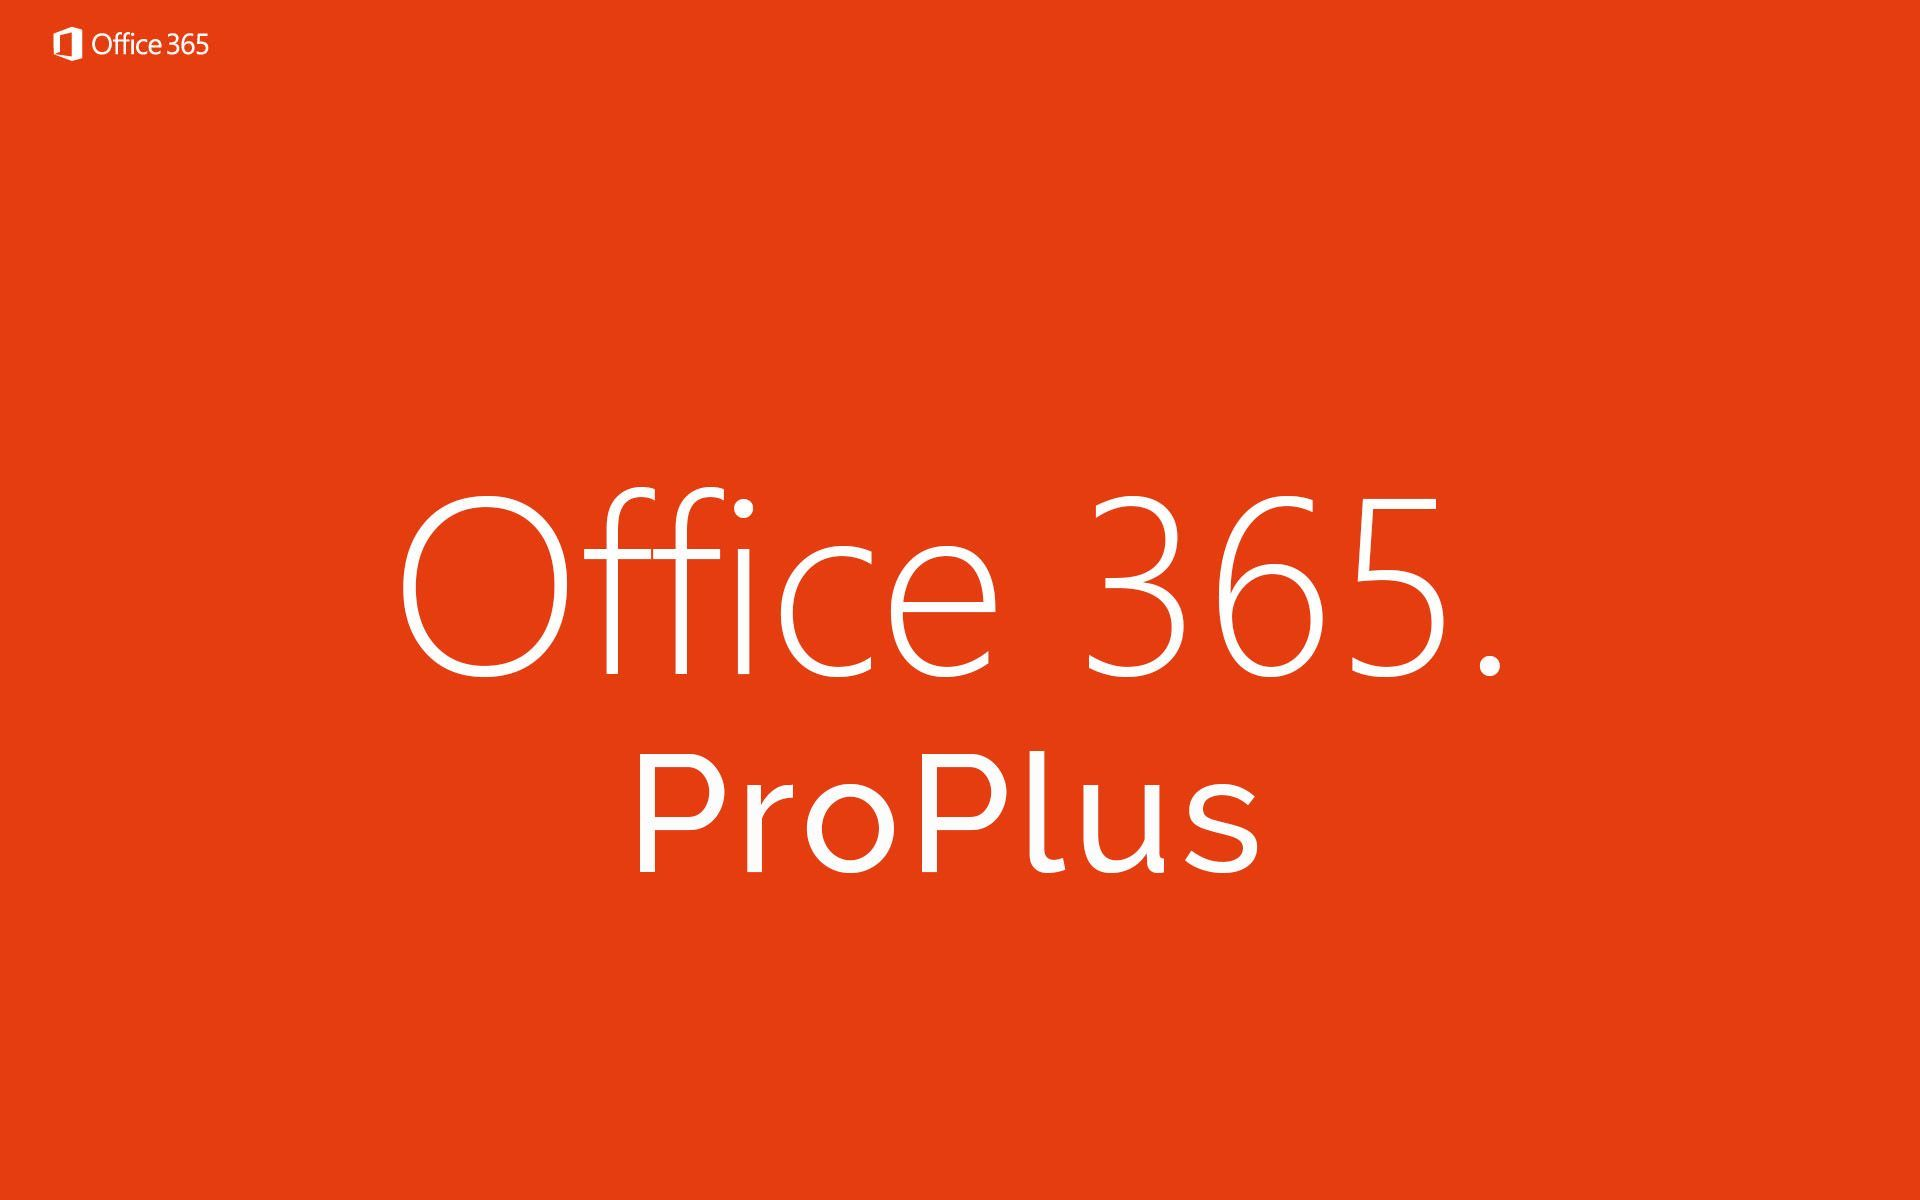 Microsoft Office 365 ProPlus Mac app store, Office 365